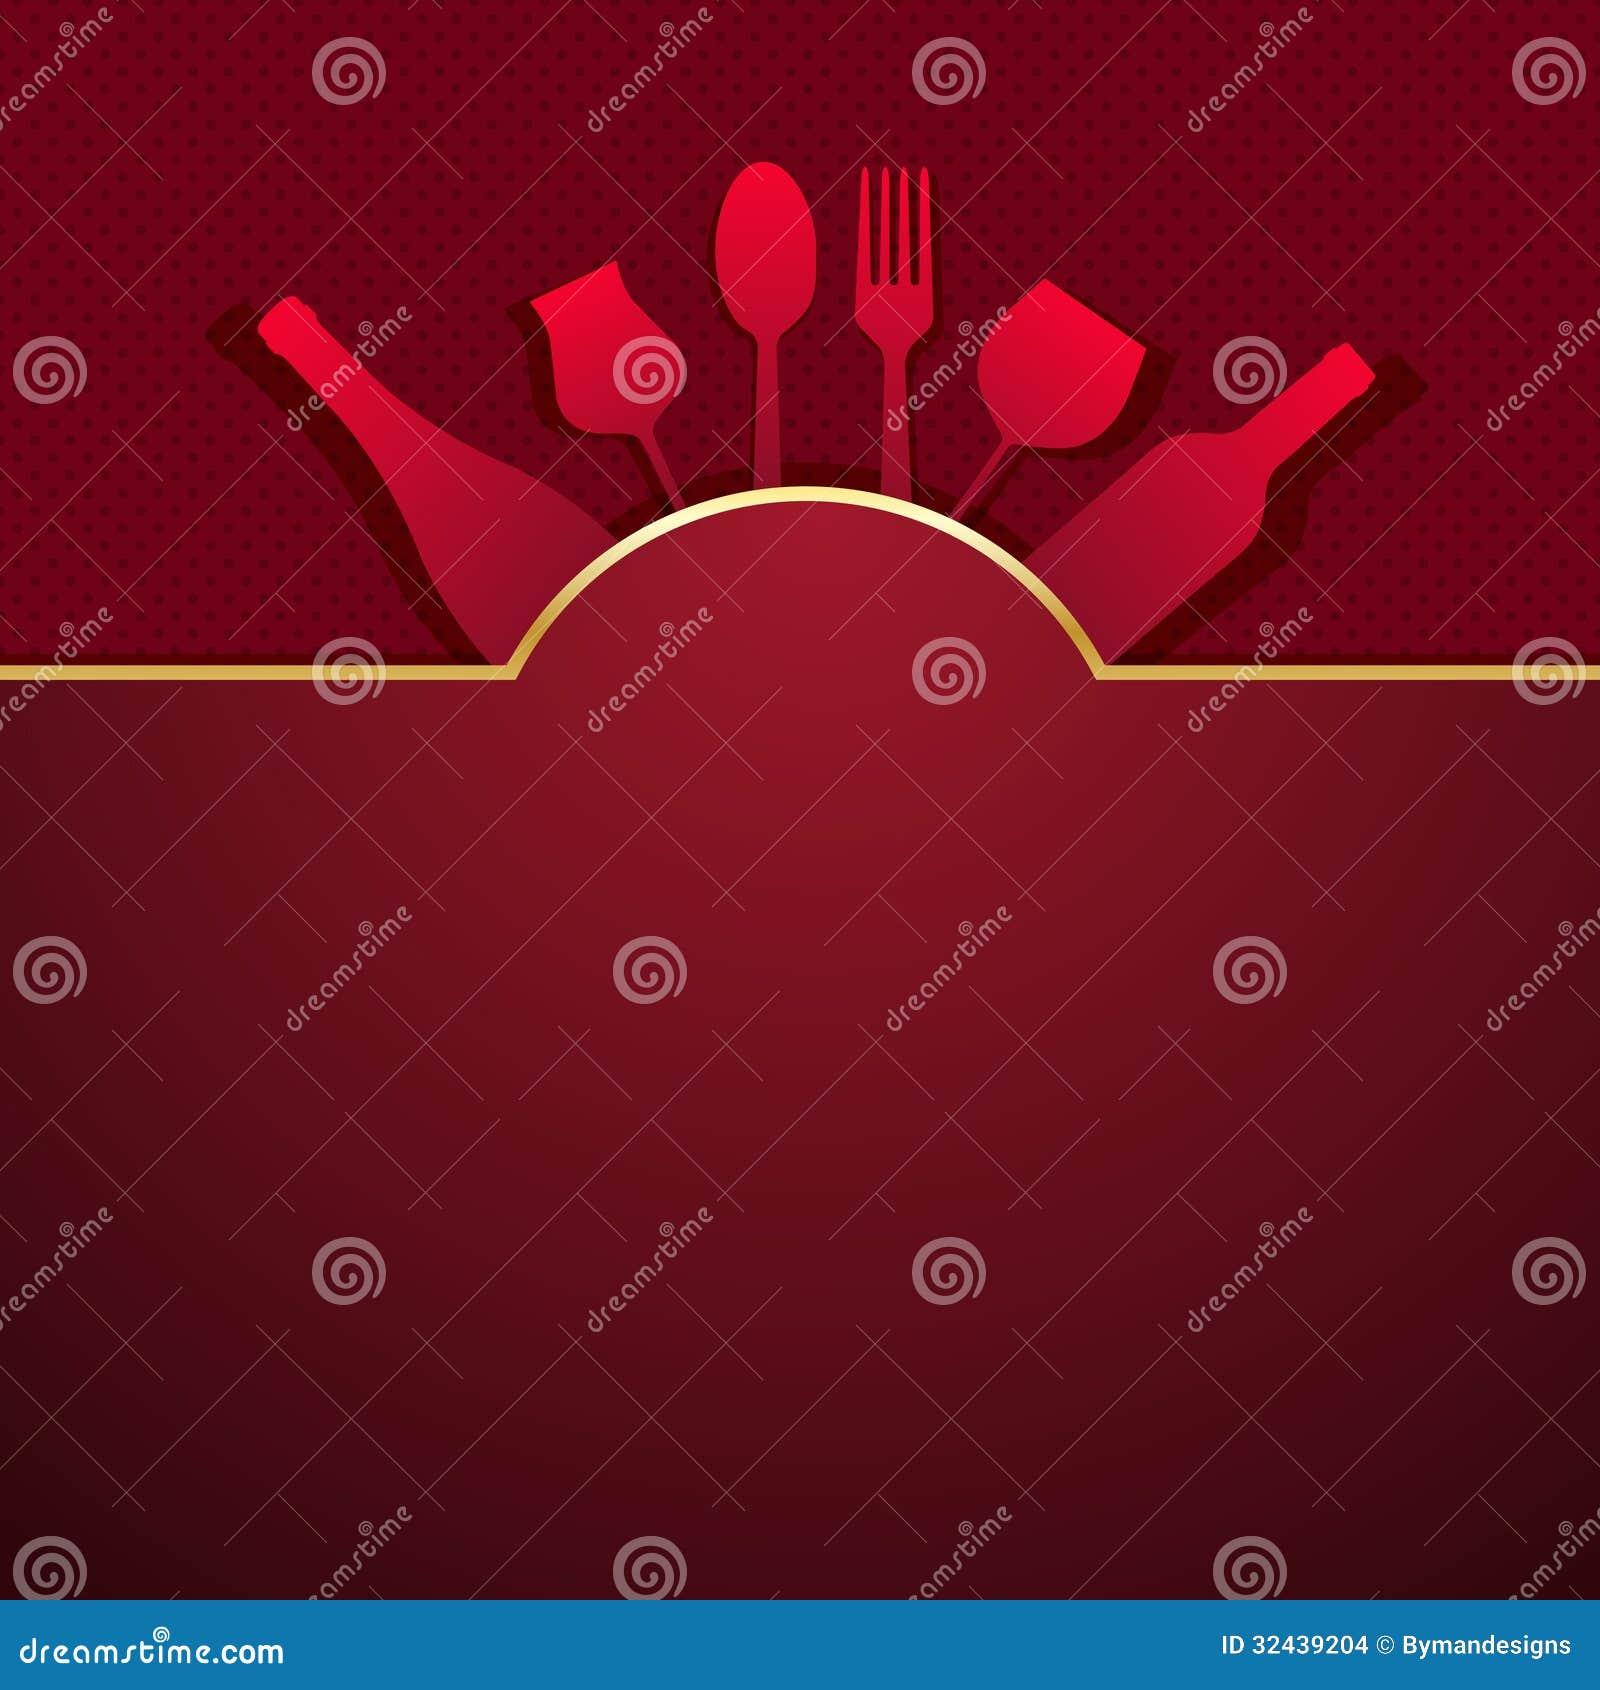 vector restaurant menu design stock images - image: 32439204